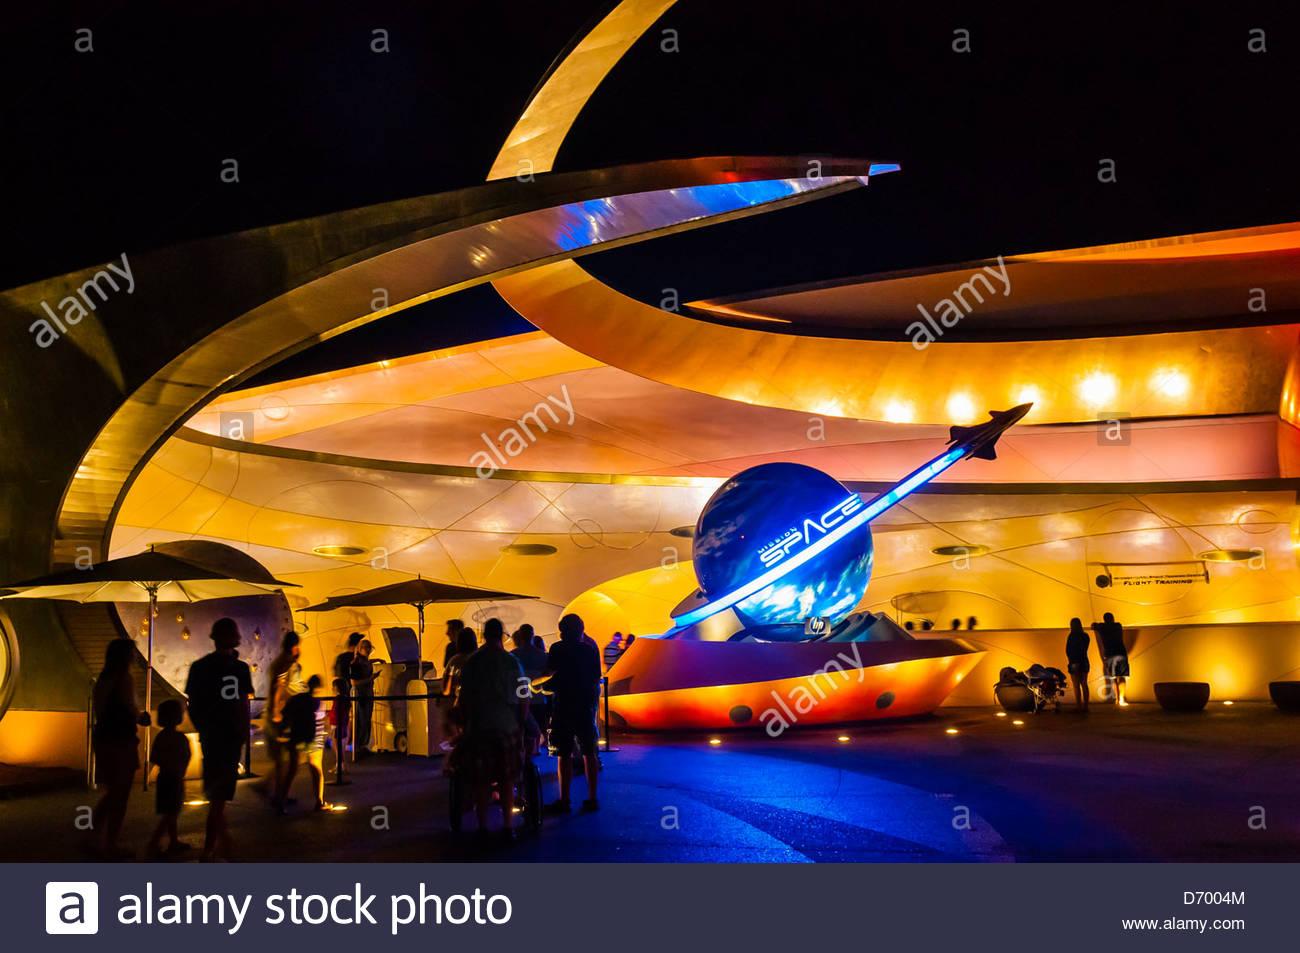 Mission:Space, Epcot, Walt Disney World, Orlando, Florida USA - Stock Image